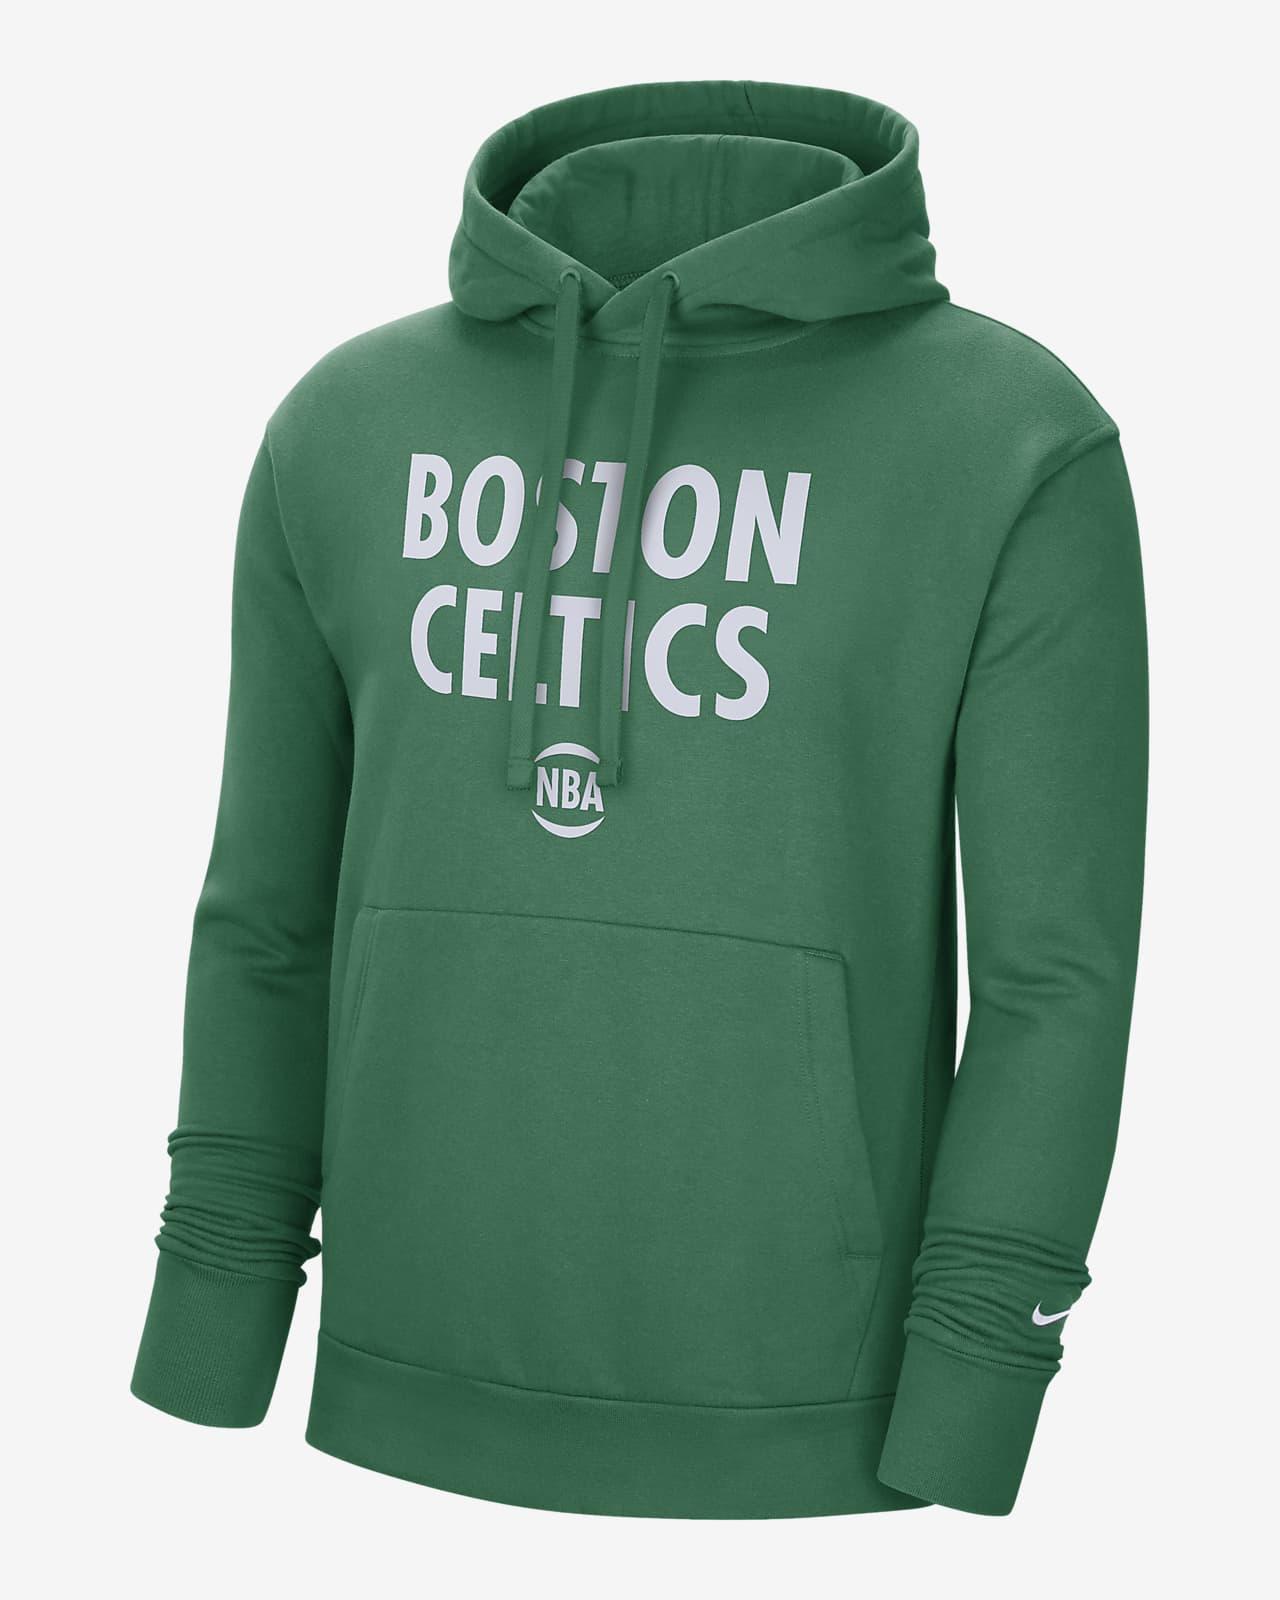 Boston Celtics City Edition Logo Men's Nike NBA Pullover Hoodie